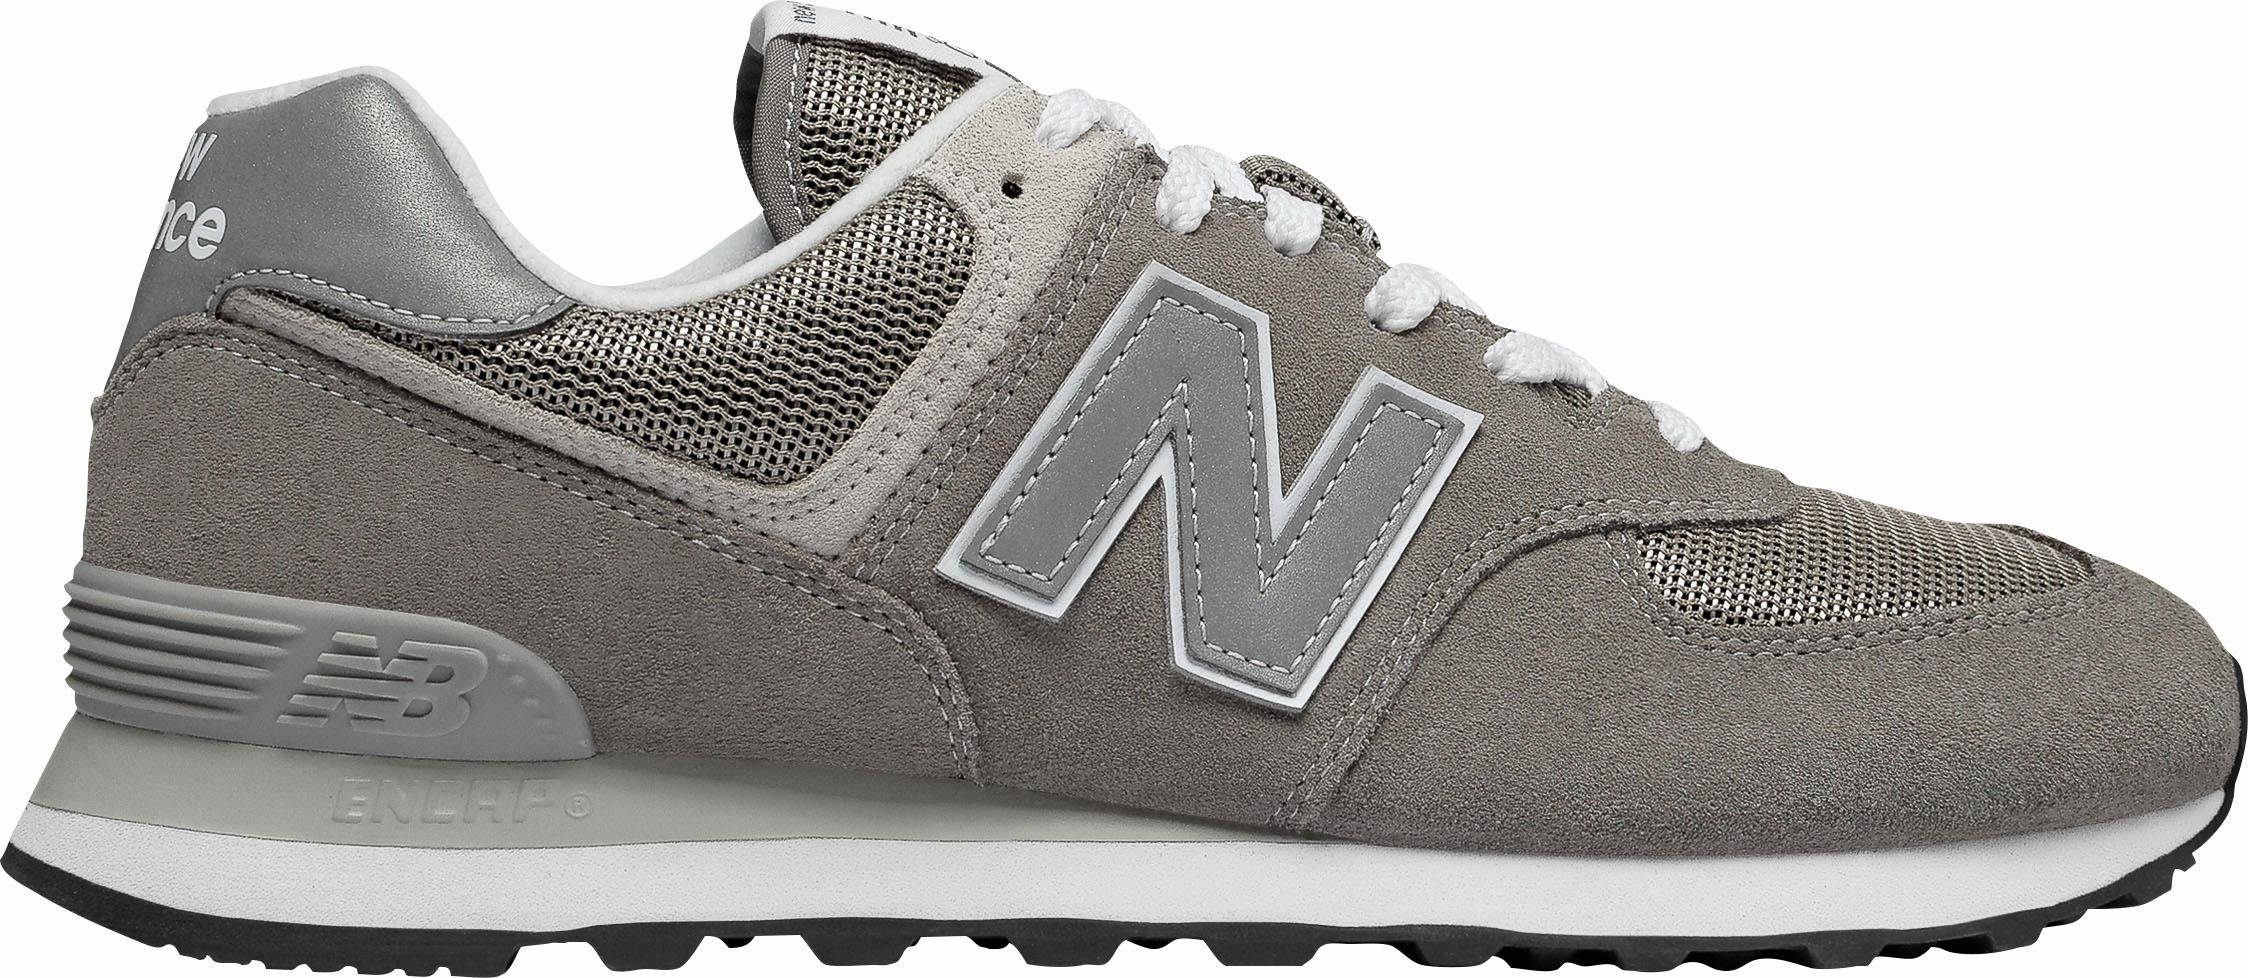 New Balance Iconic ML 574 Grey Day Sneaker  grau